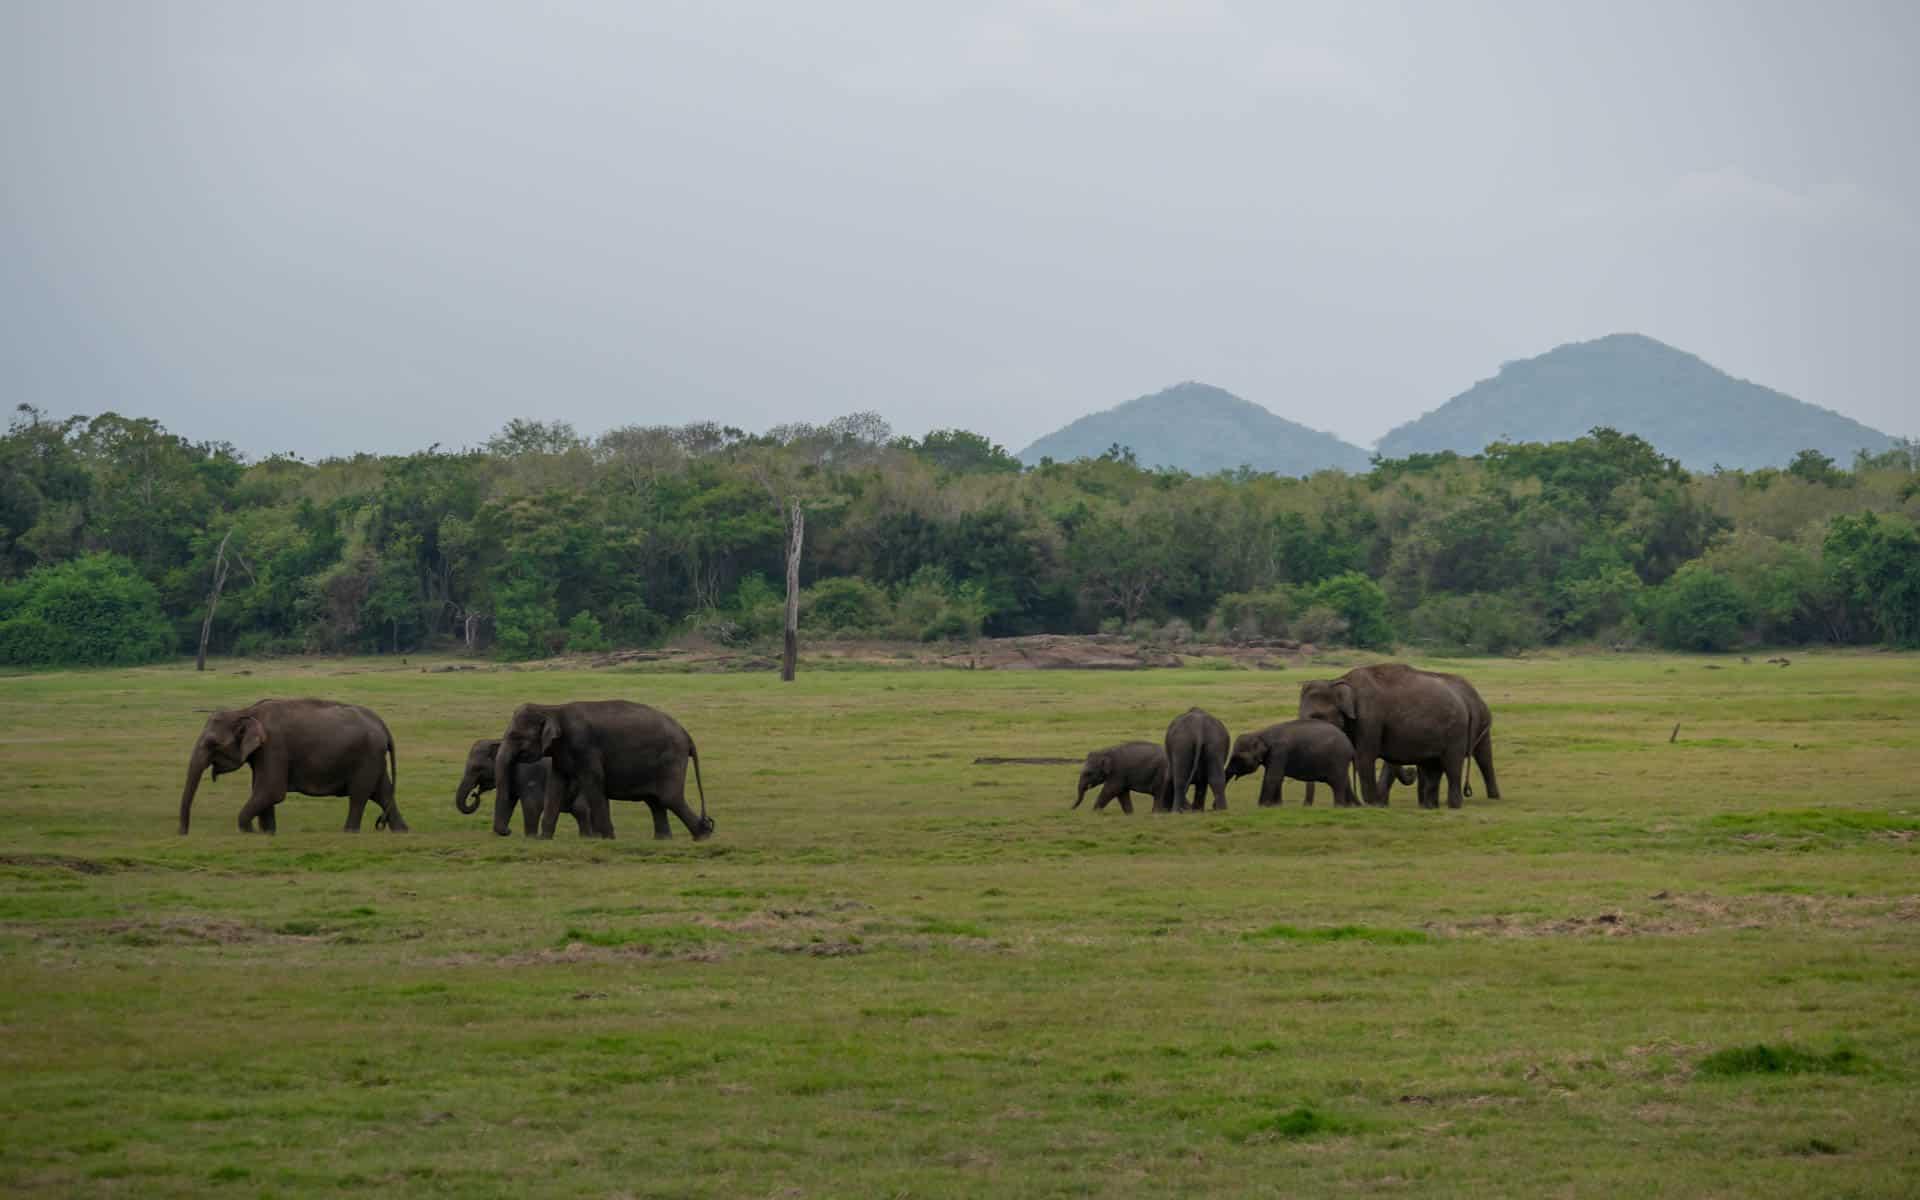 safari-wild-elephants-landscape